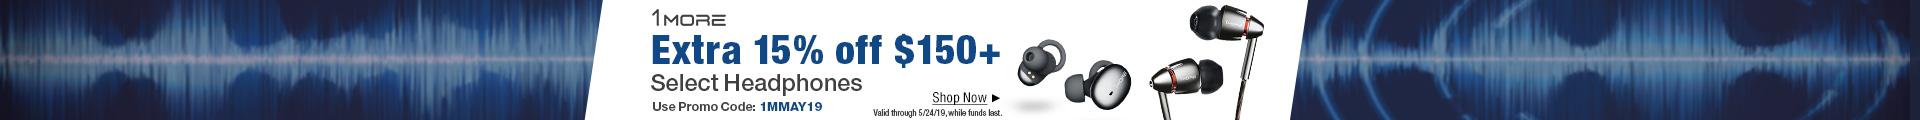 Extra 15% off $150+ select headphones